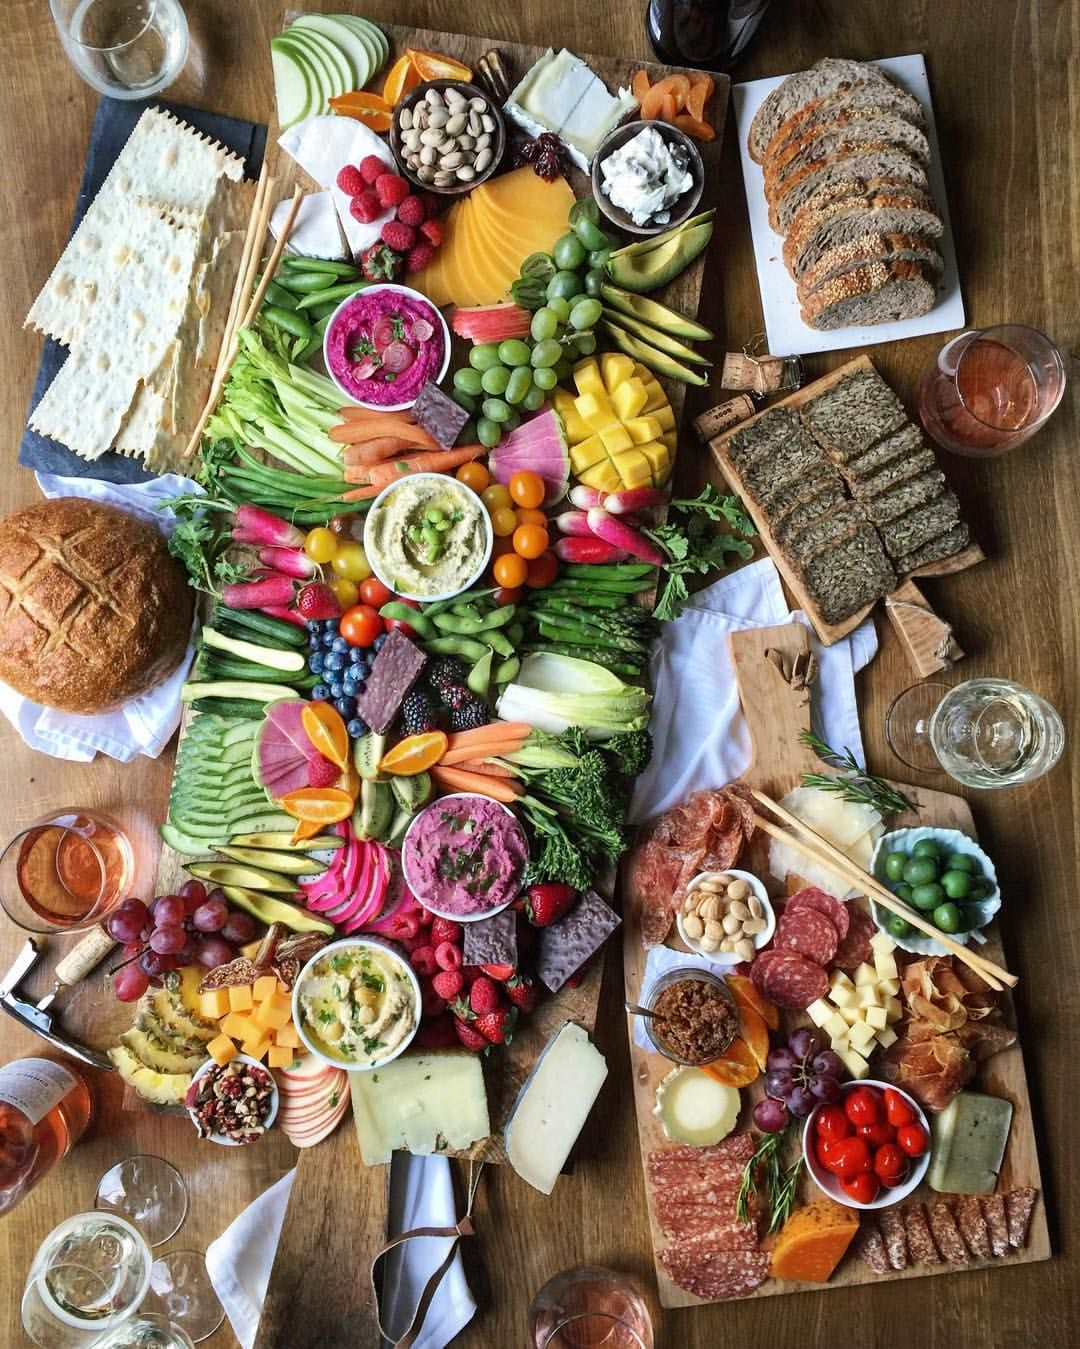 pingl par barb miller sur fruit cheese meat veggie trays pinterest ap ro id es ap ritif. Black Bedroom Furniture Sets. Home Design Ideas